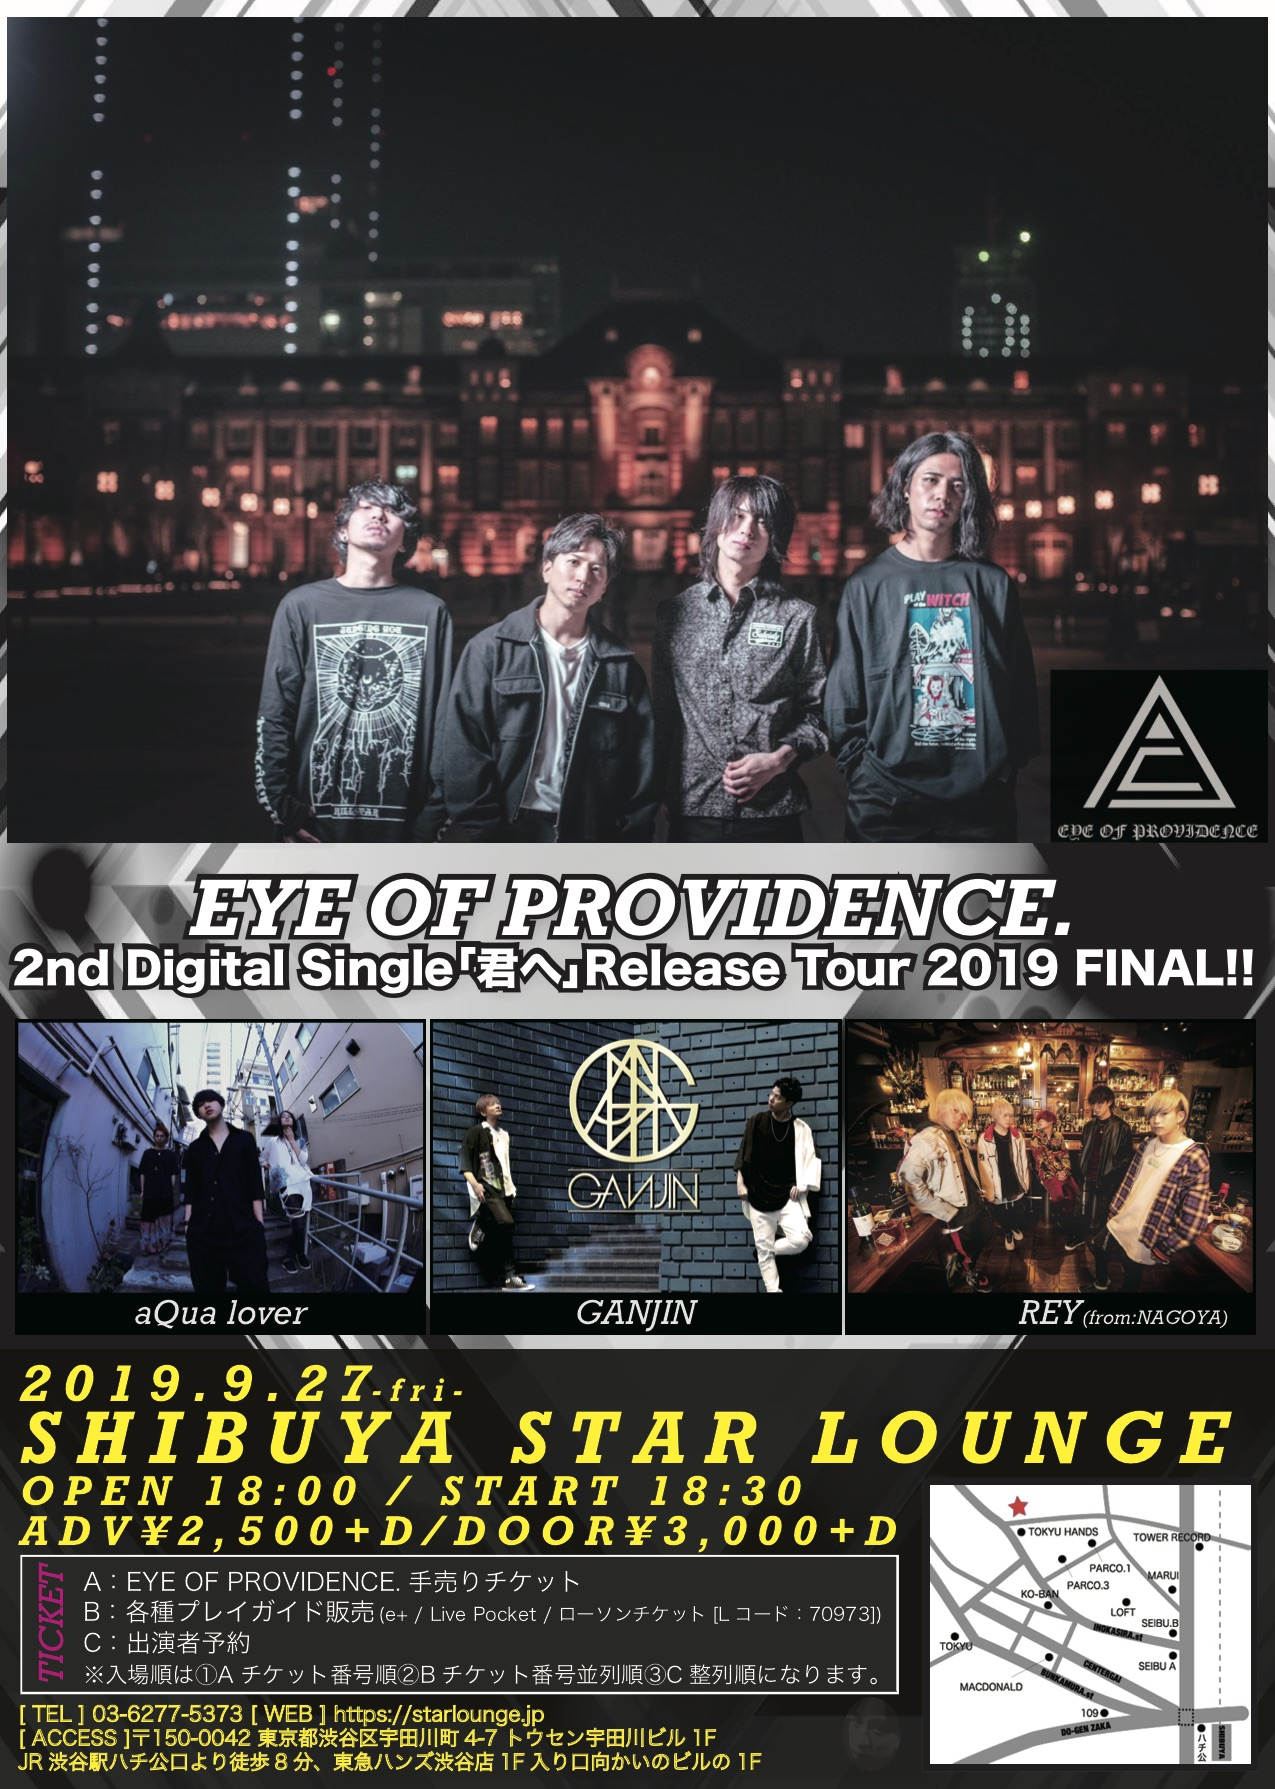 EYE OF PROVIDENCE. 2nd Digital Single「君へ」Release Tour 2019 FINAL!!